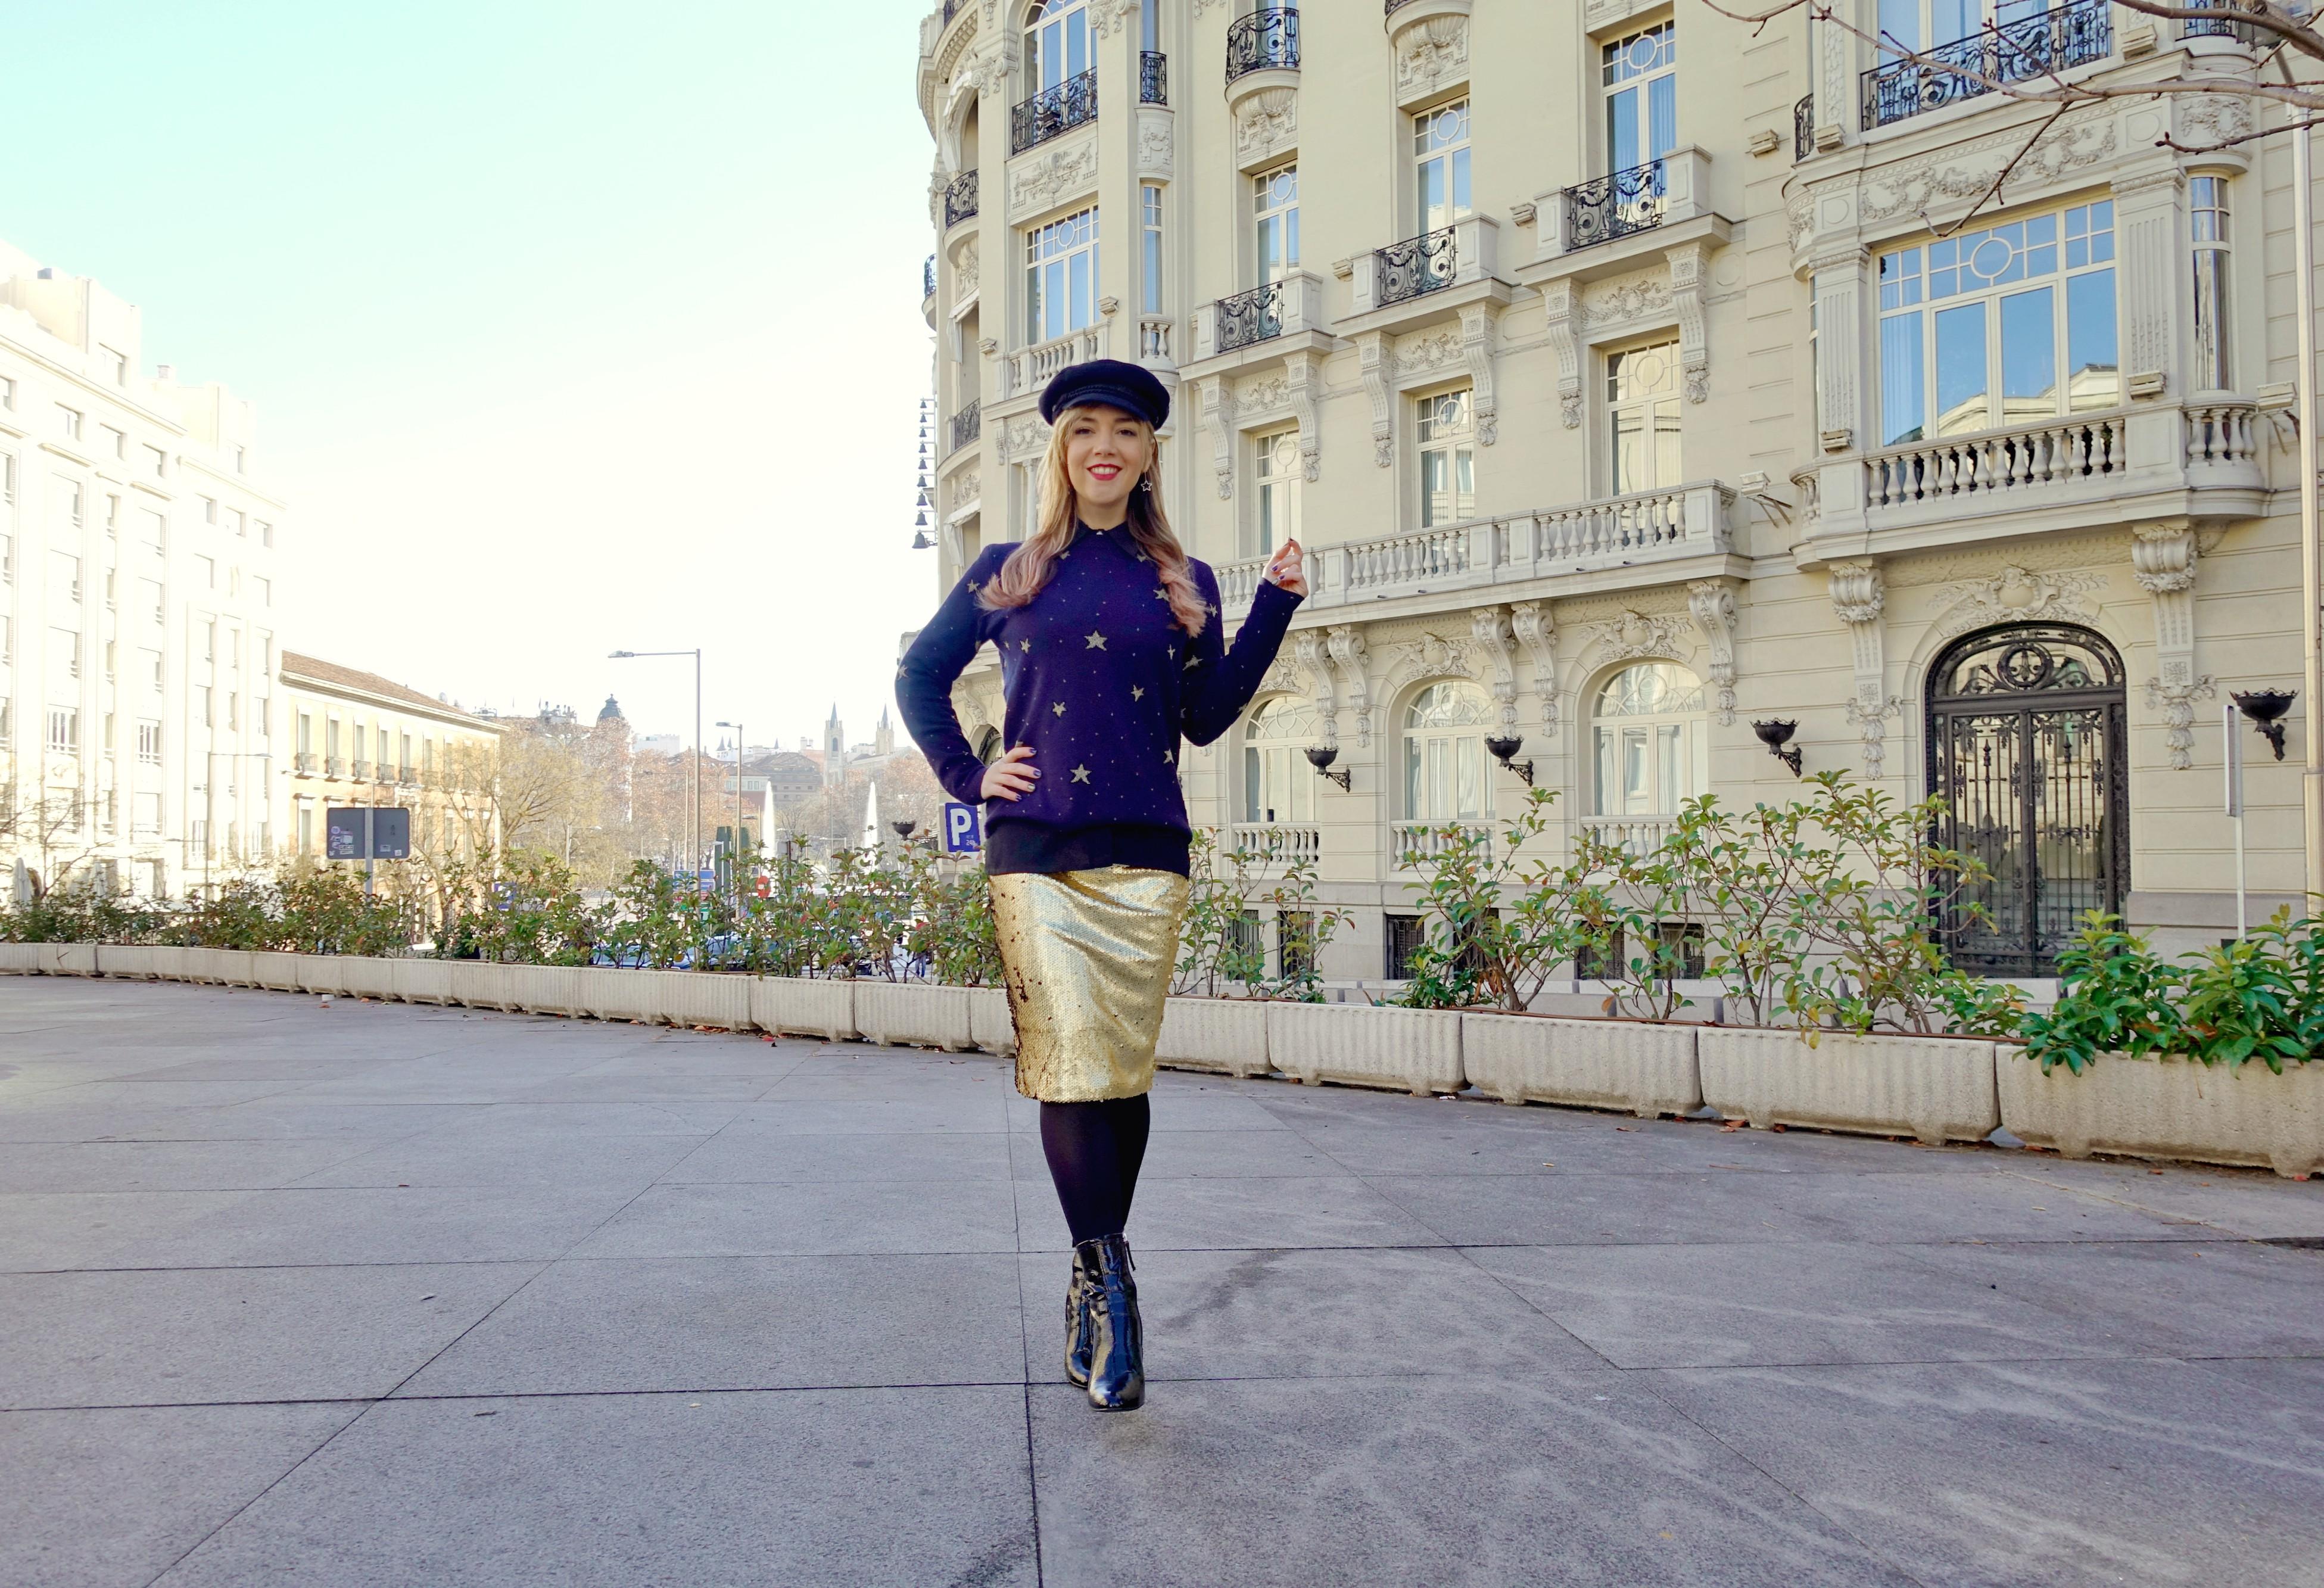 Gorritos-vintage-ChicAdicta-blog-de-moda-Madrid-Chic-Adicta-Amichi-look-dorado-influencer-stars-sweater-PiensaenChic-Piensa-en-Chic